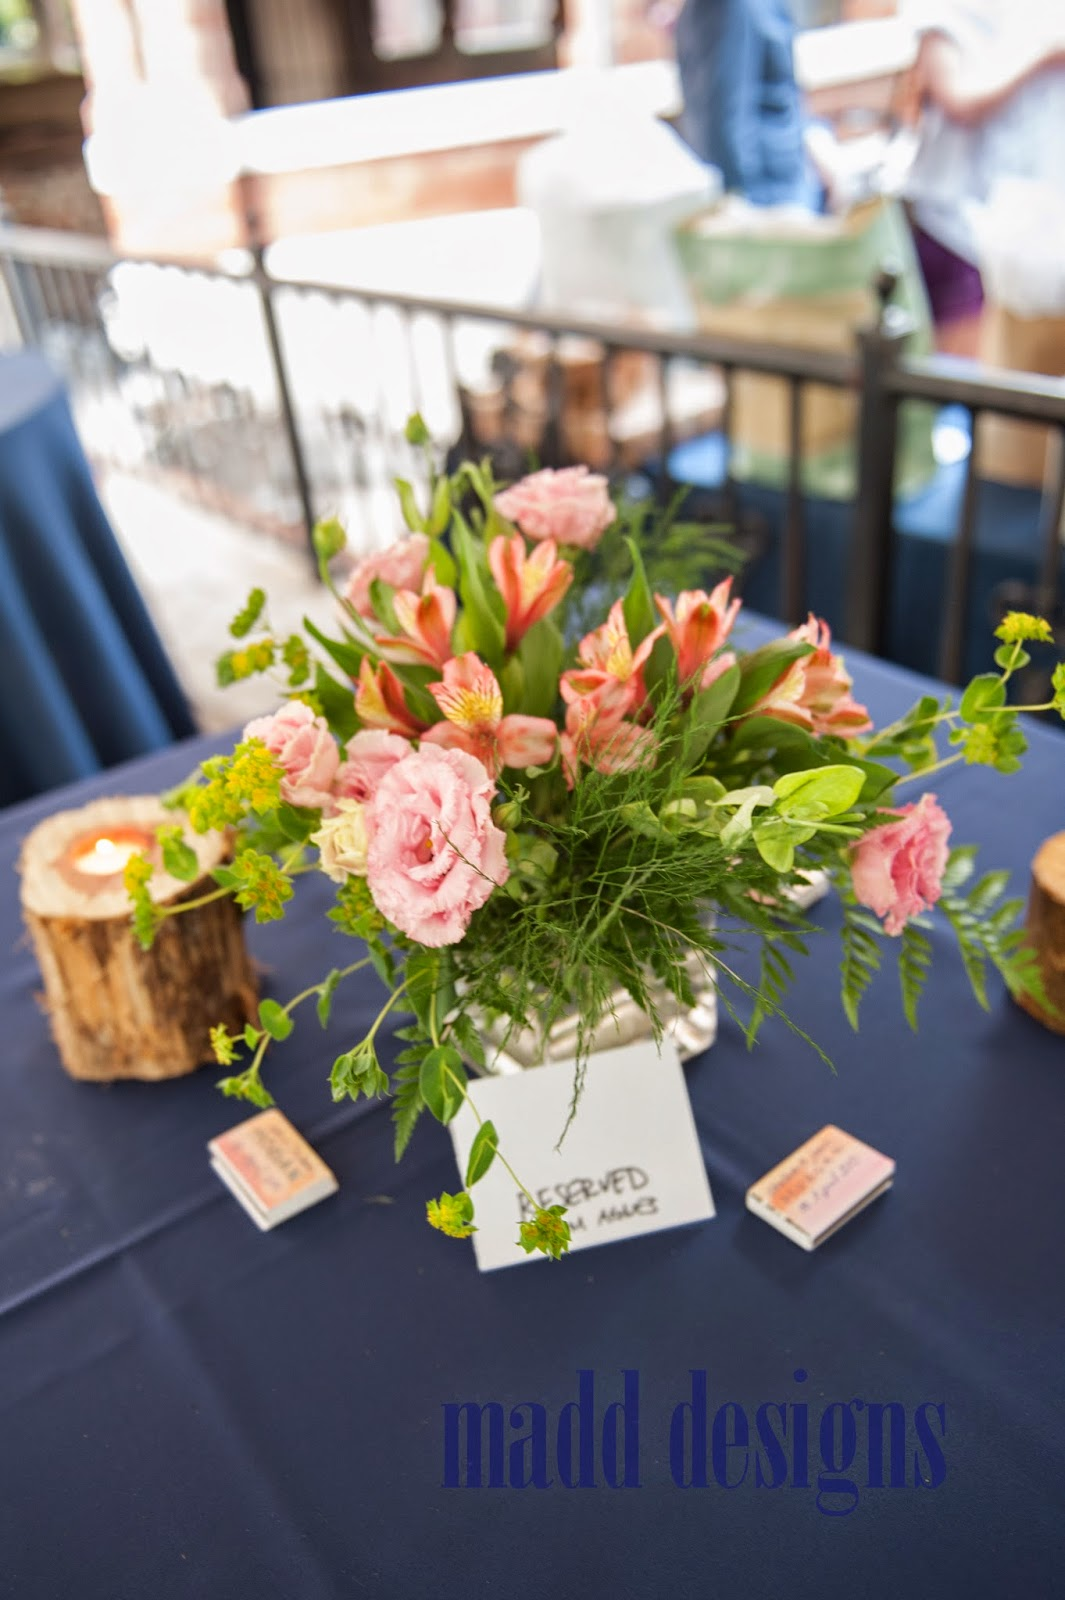 madd designs maddflowers bright spring wedding flowers